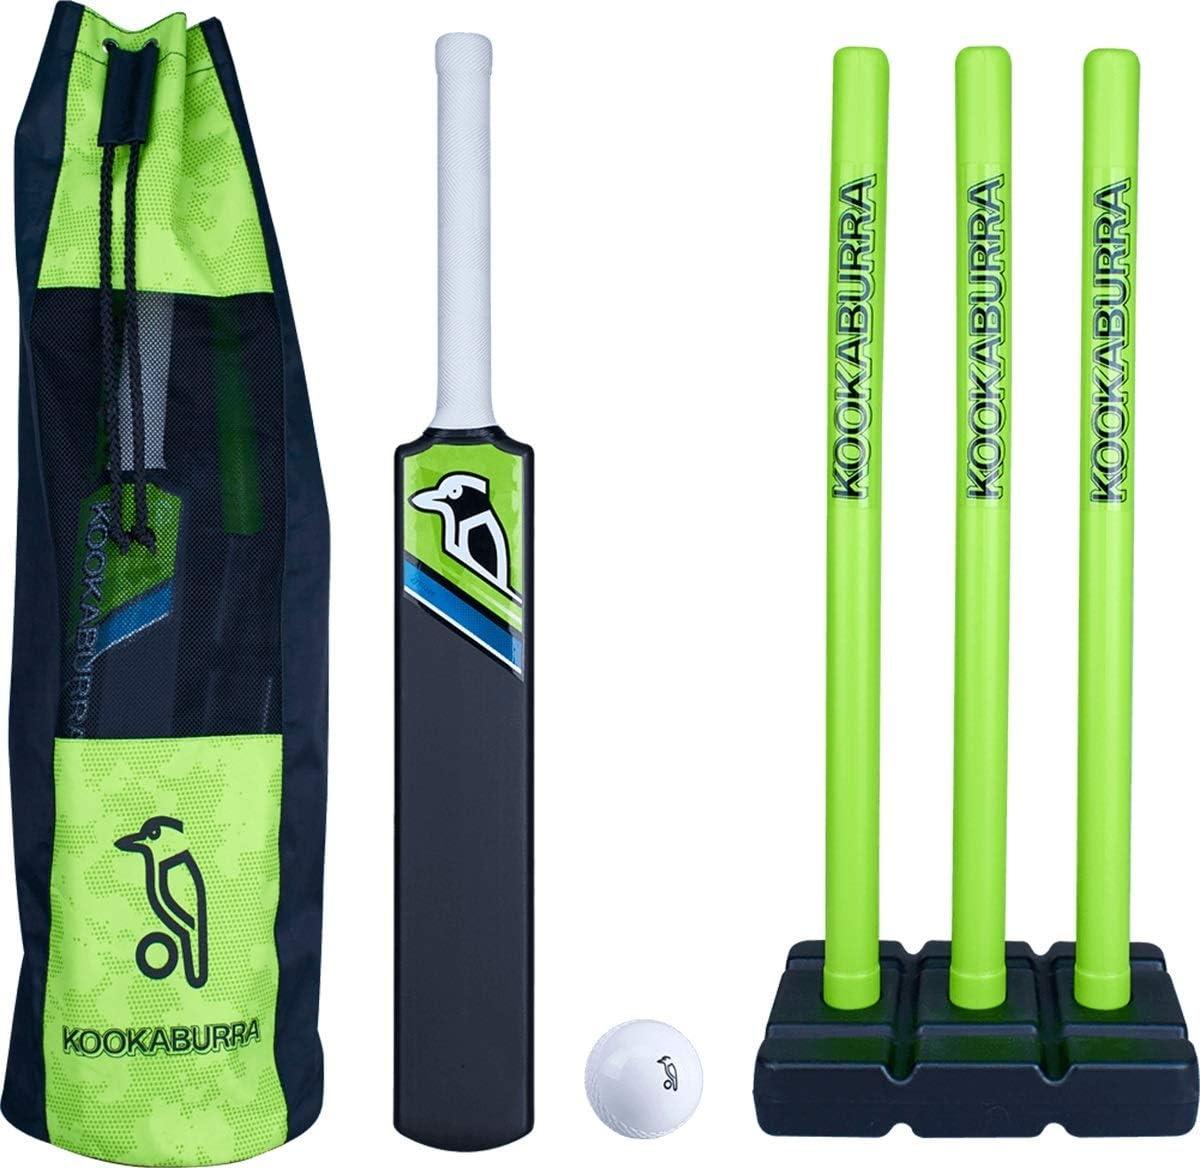 Kookaburra Blast Set Cricket Set Ball Bat Stump Garden Play Safe Plastic Toy